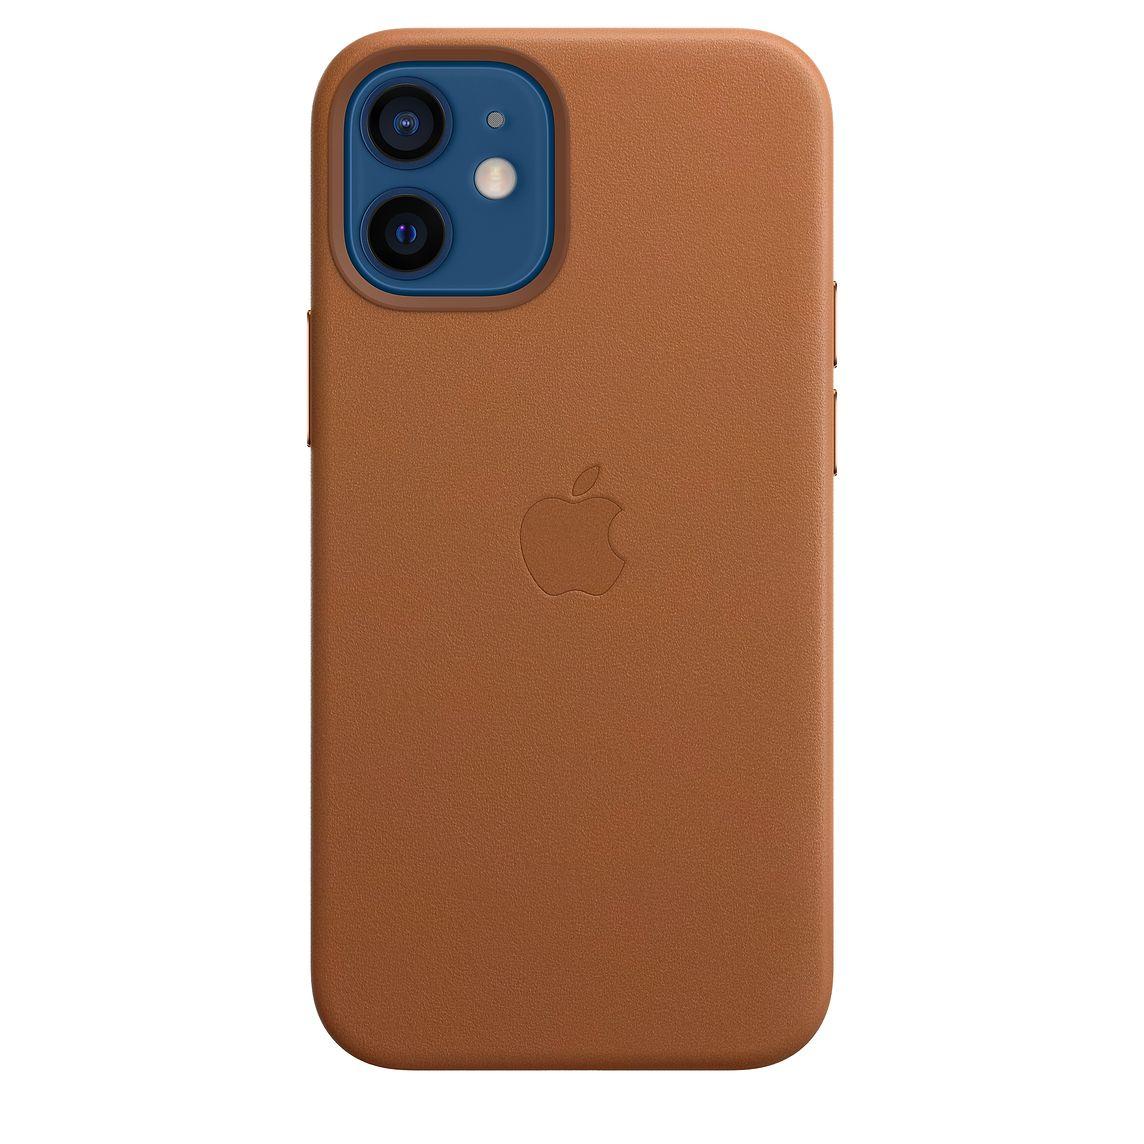 Apple 아이폰 맥세이프 가죽 케이스